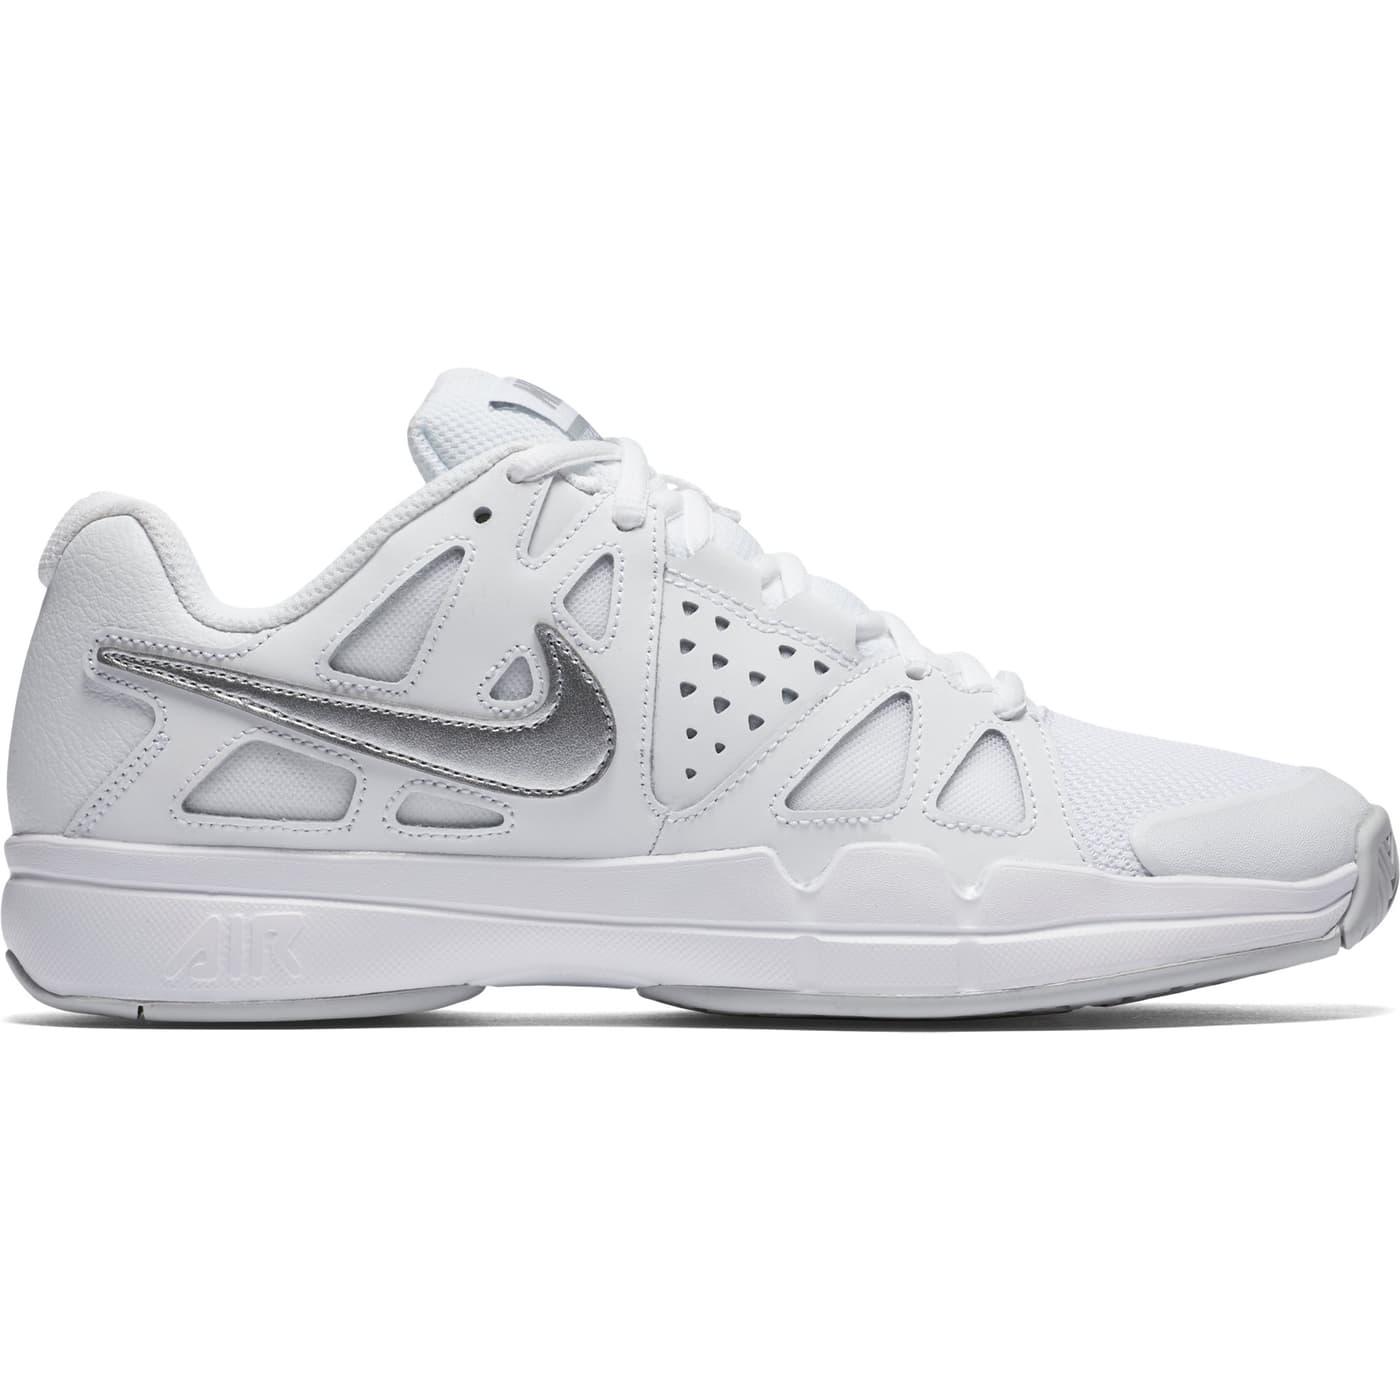 best service 0751d efde3 Nike Air Vapor Advantage Scarpa da tennis donna